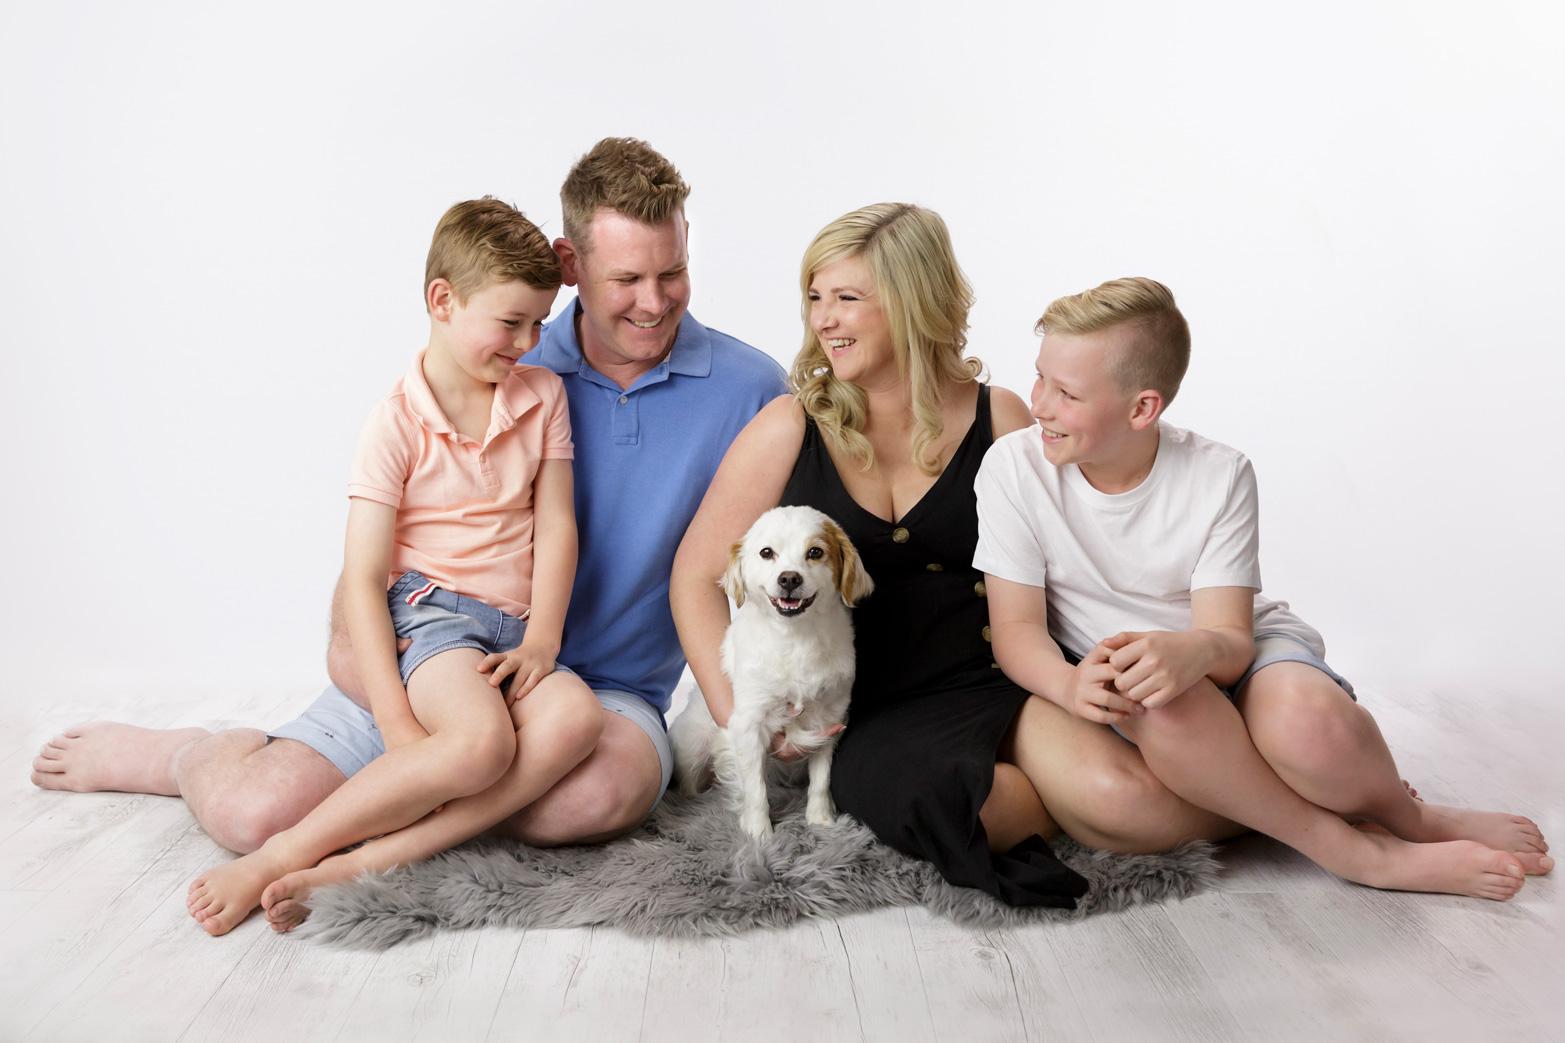 family photo including family dog